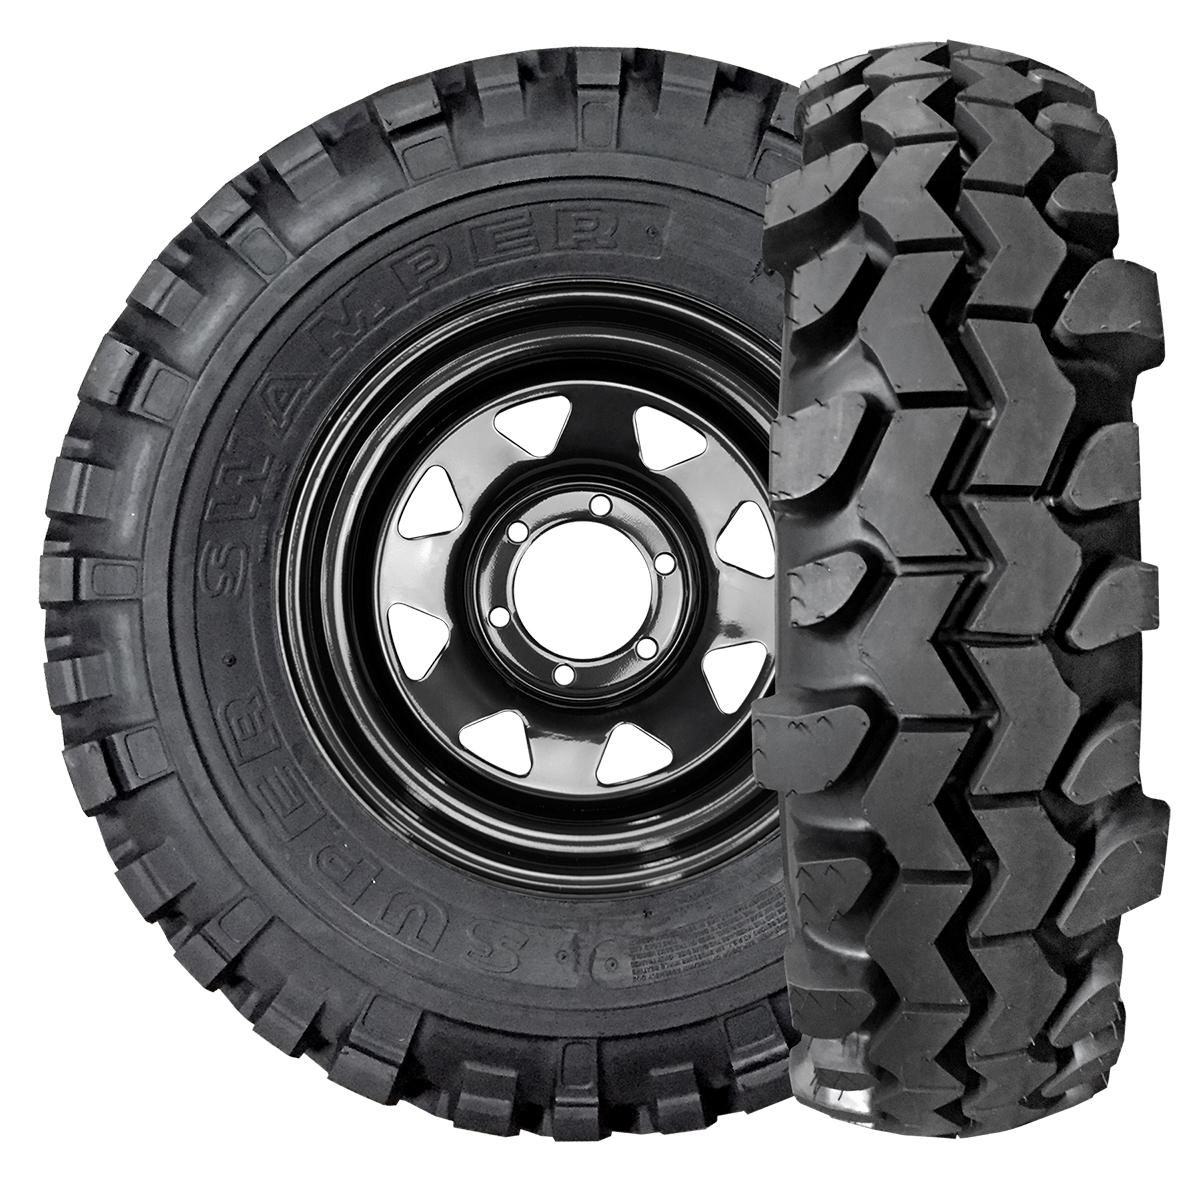 The Blem List | Interco Tire